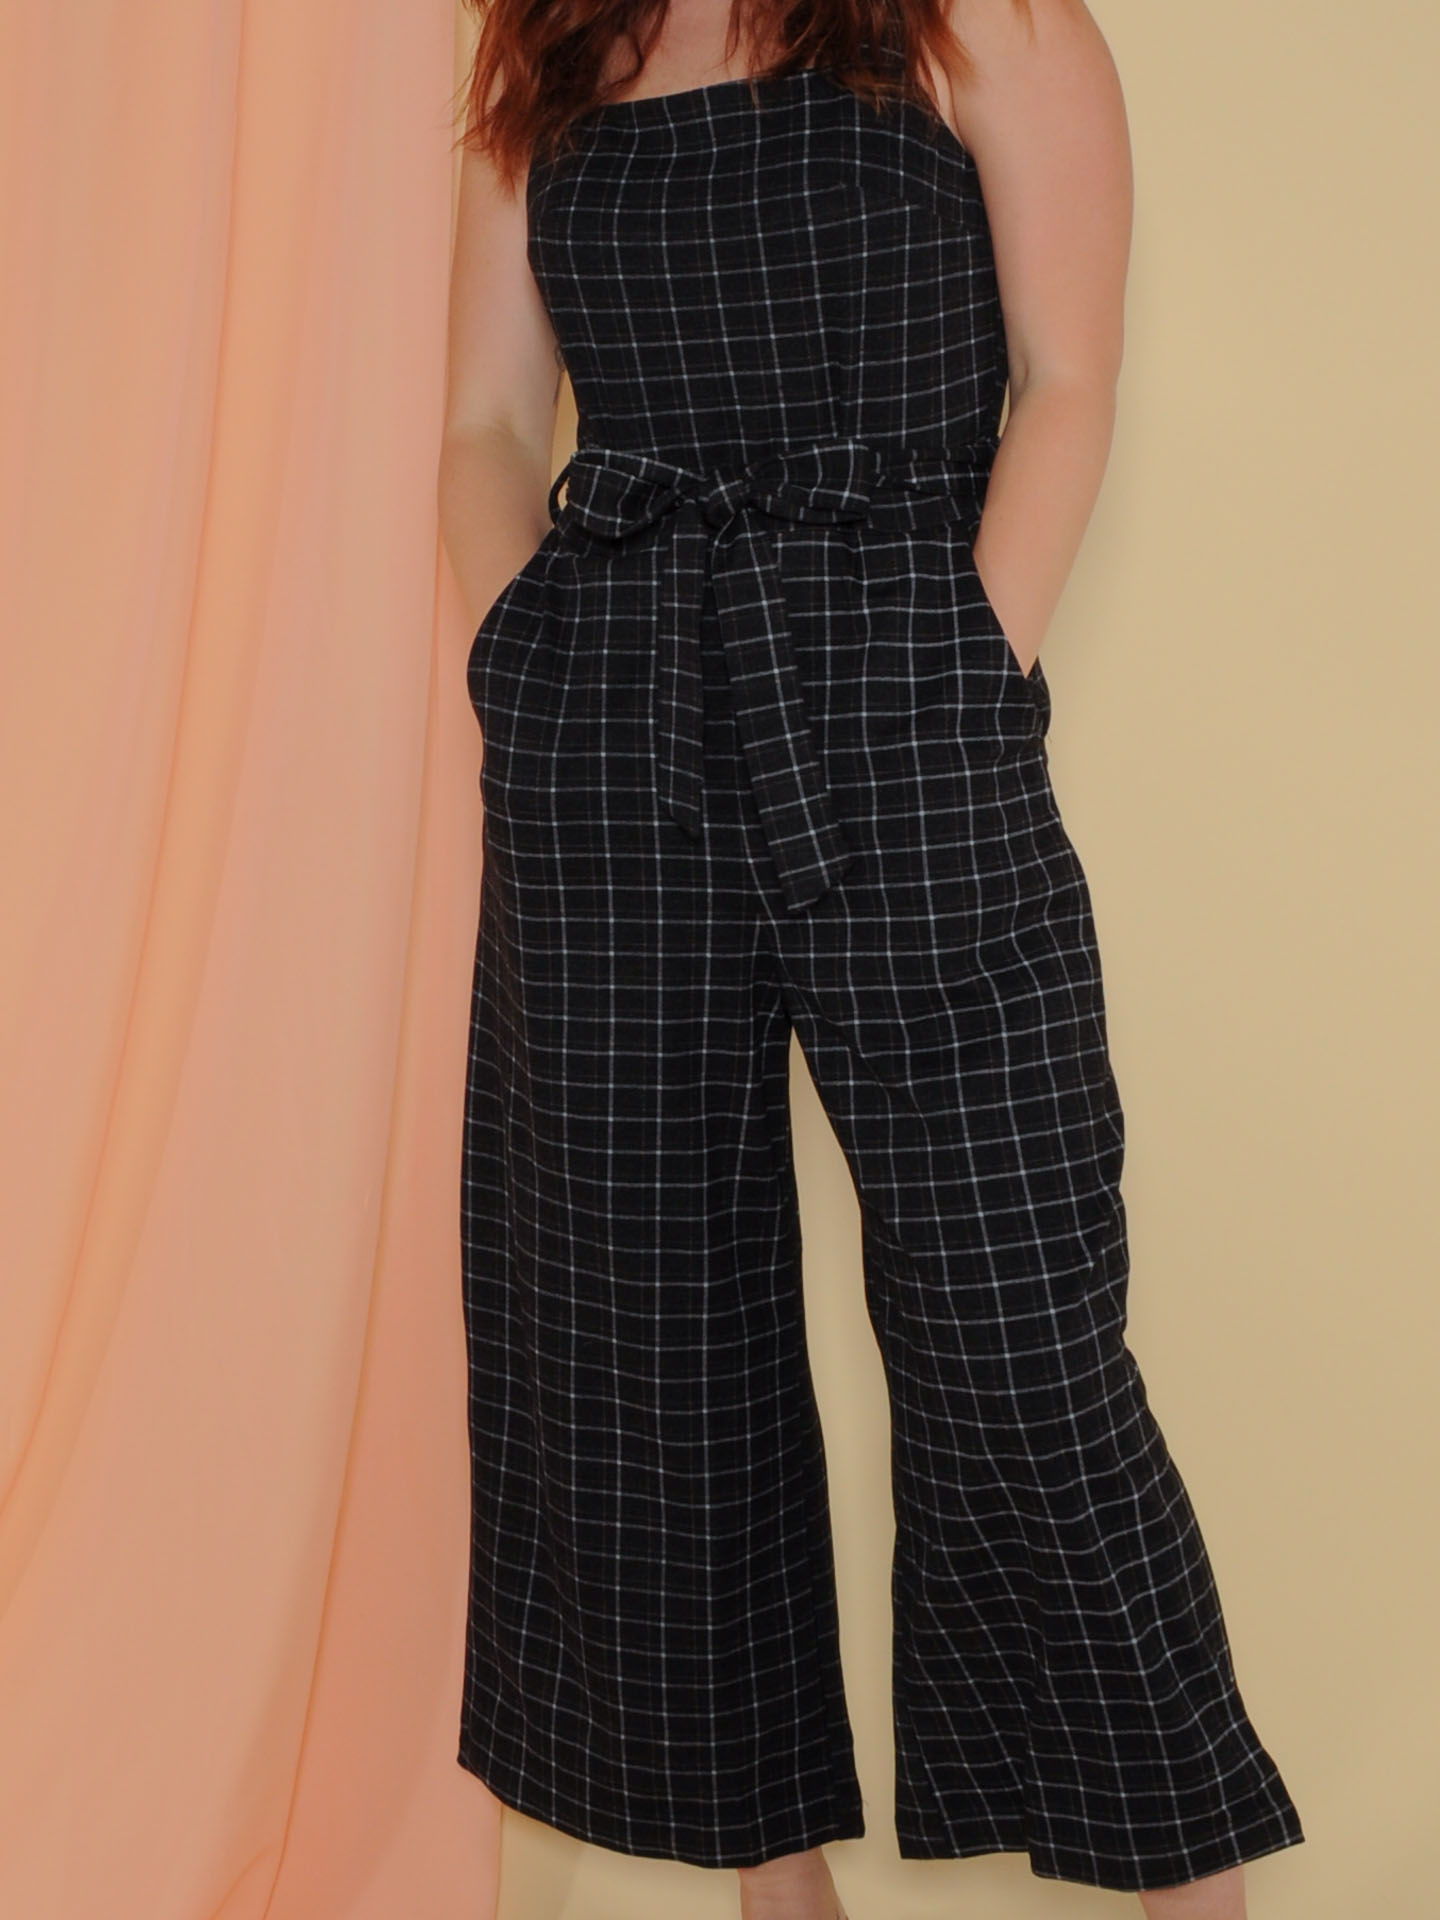 Katniss Jumper Grid Print Wide Leg Romper Front